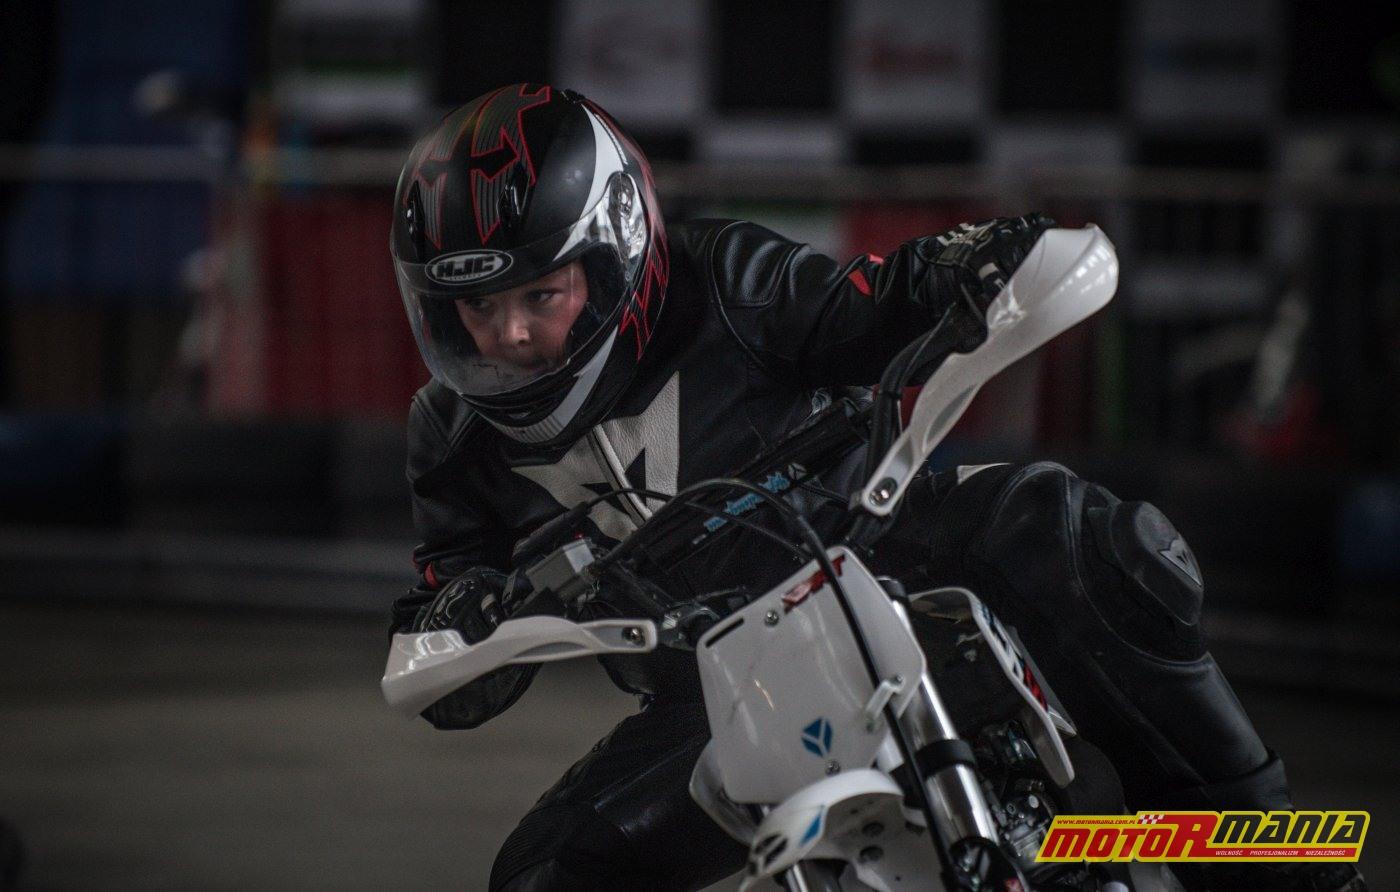 MotoRmania KidzGP Team - treningi przed sezonem 2019 (3)